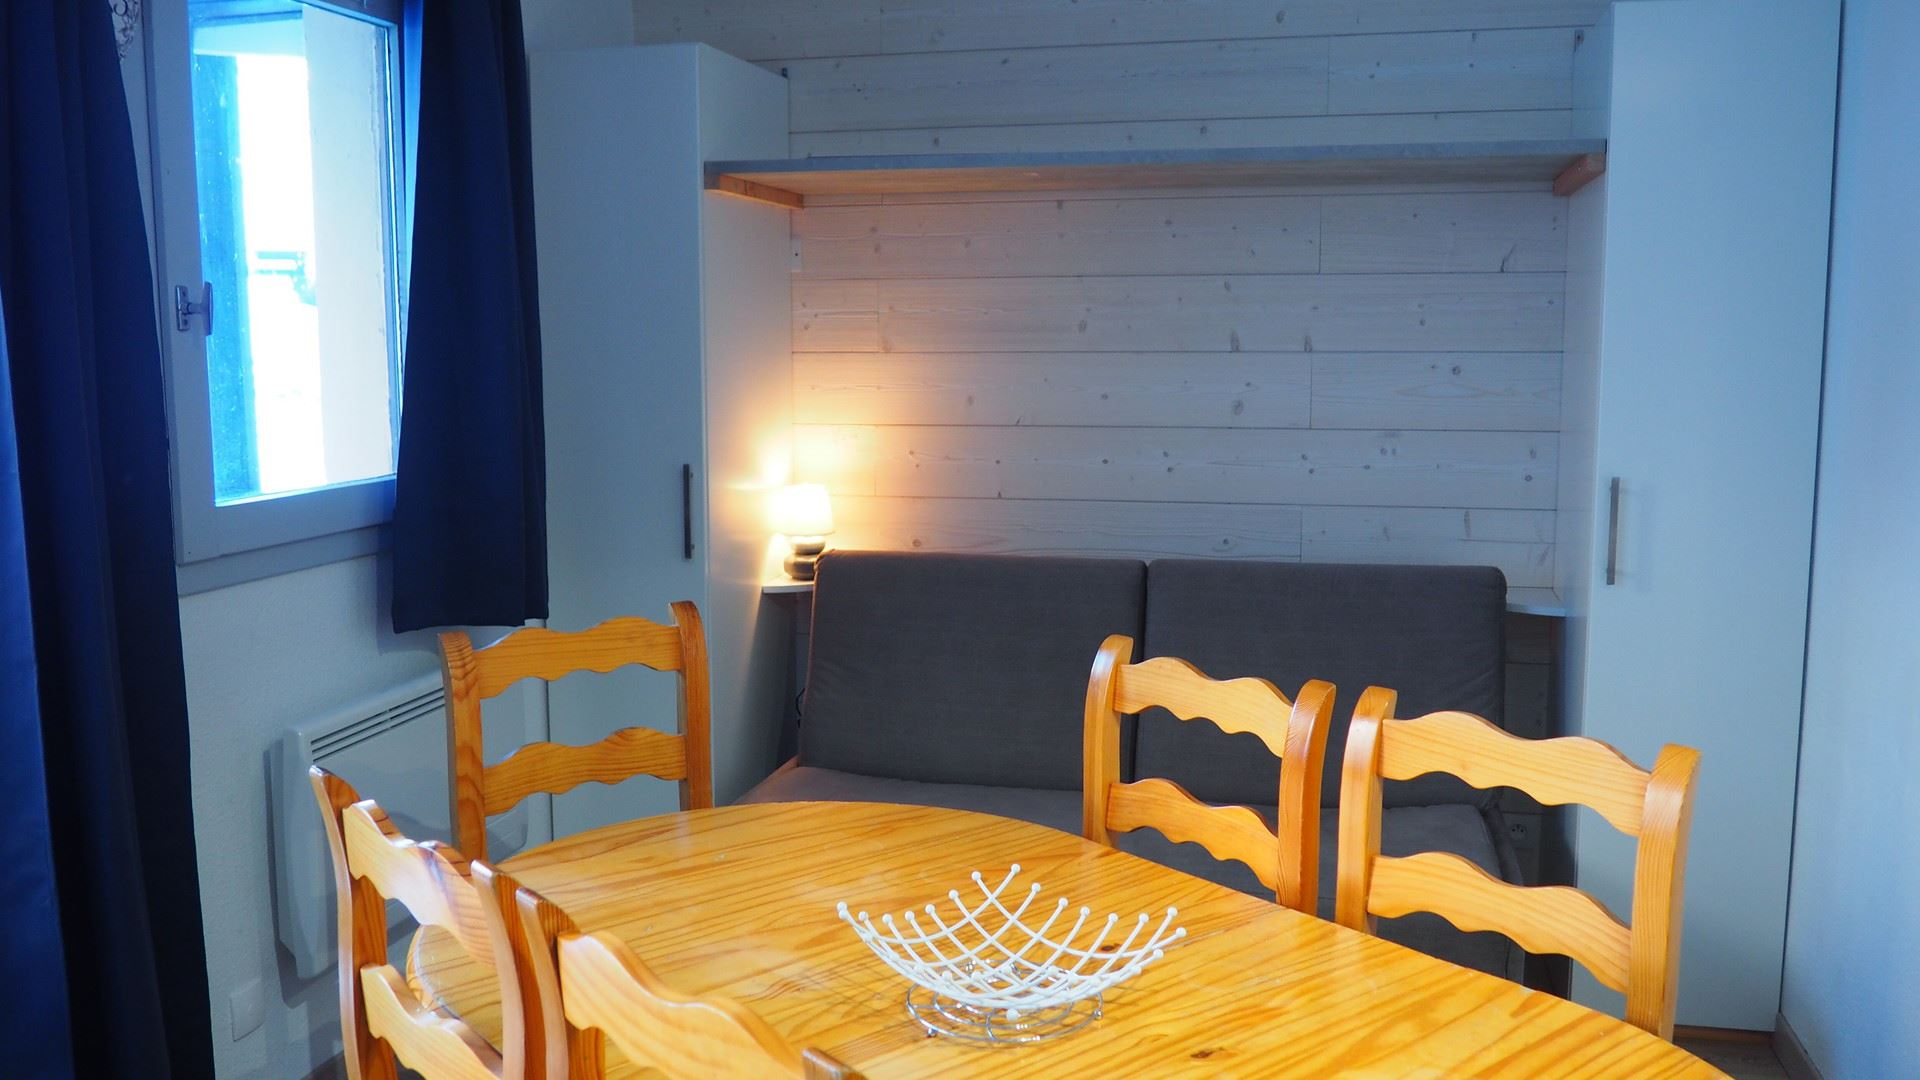 2 Rooms 5 Pers ski-in-ski-out / Villaret 617